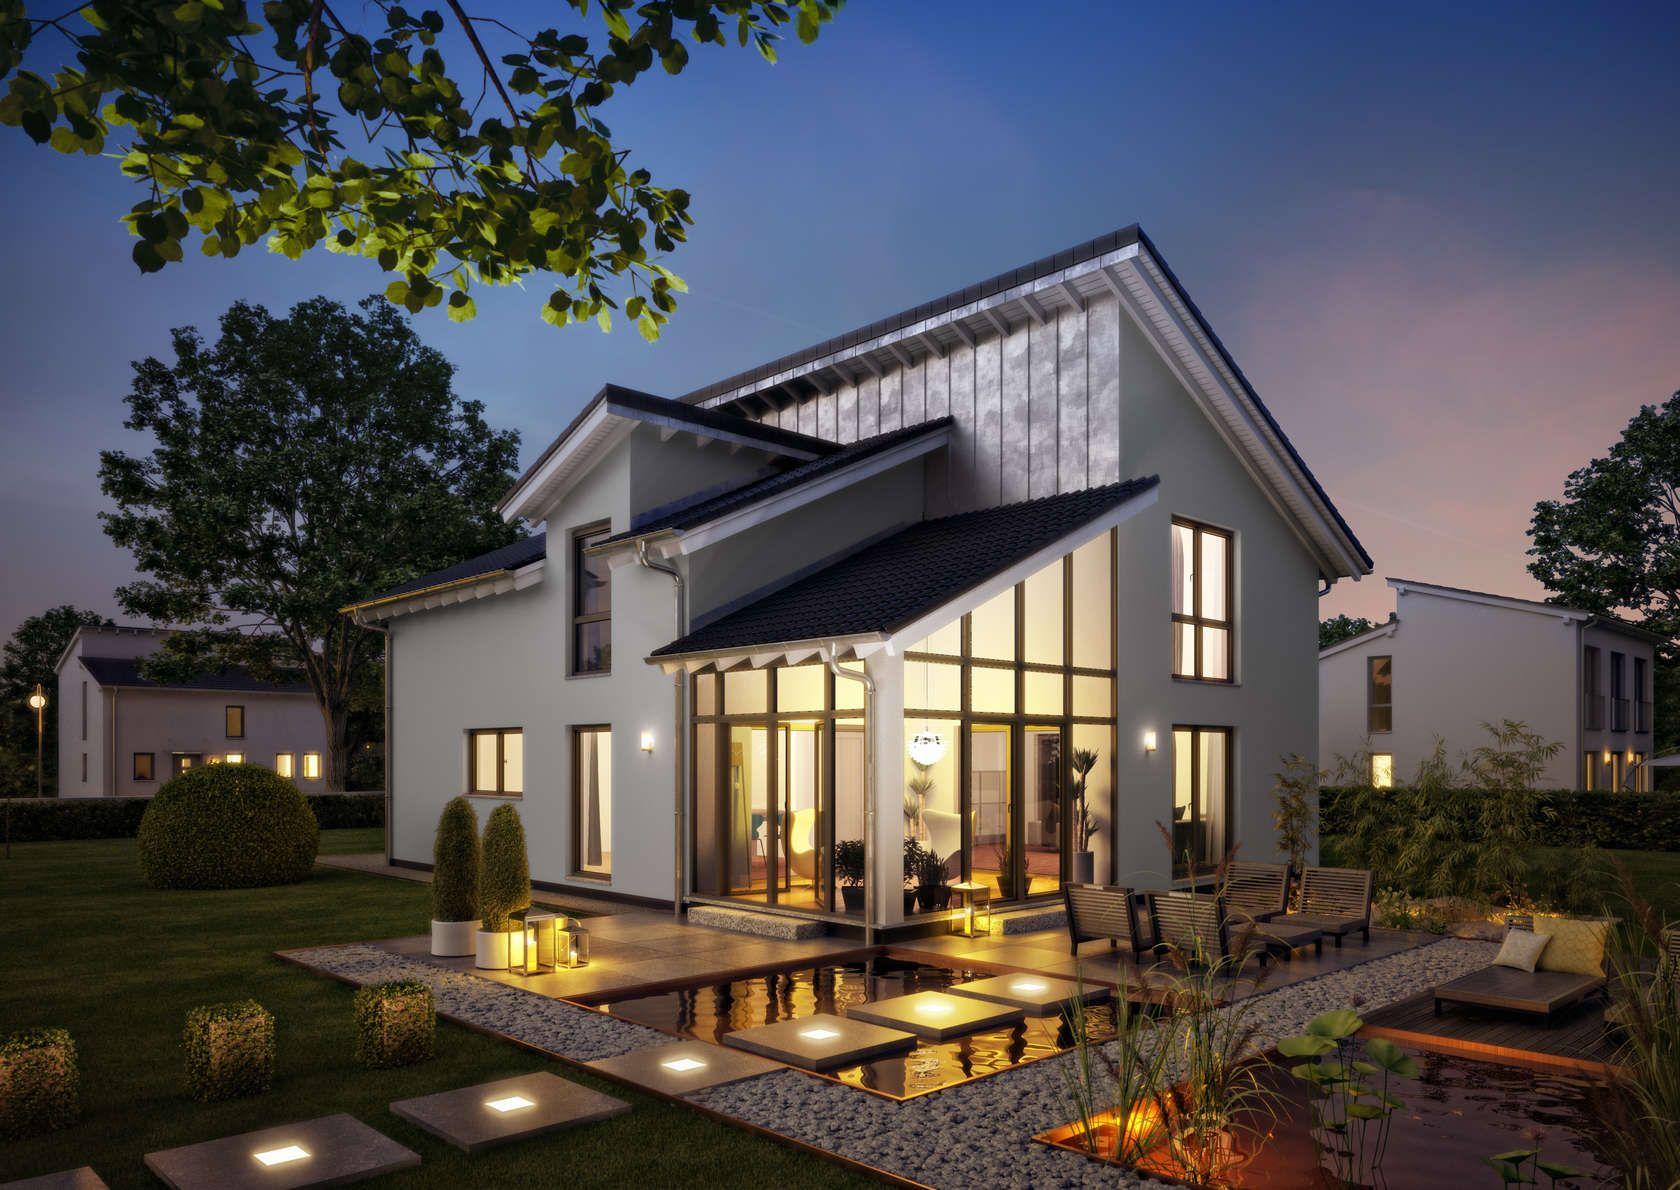 Familienhäuser Haus, Kern haus und Familienhaus